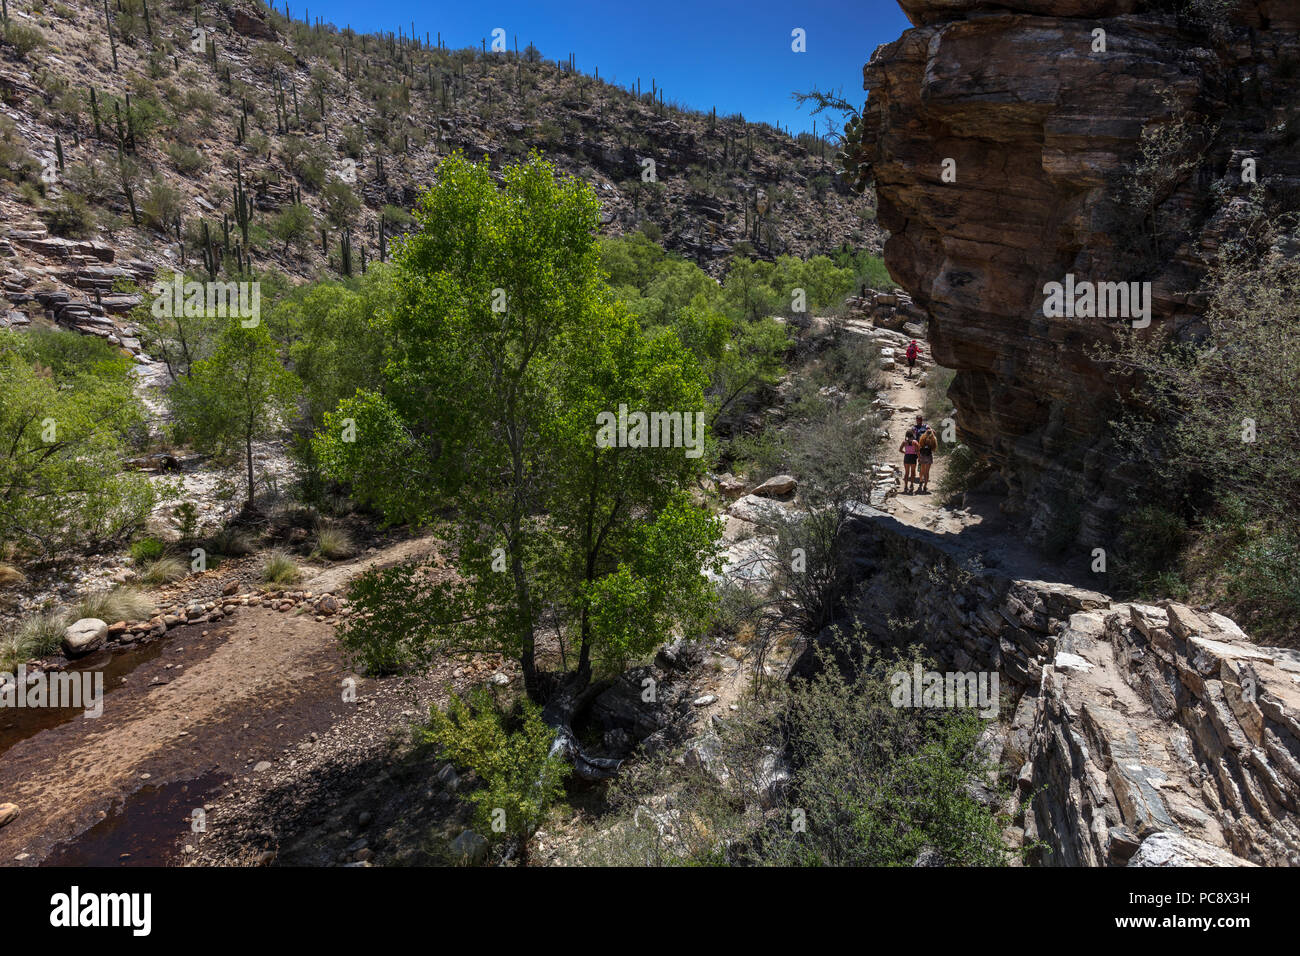 Niedrige Wasser bei Riparian Oase, Sabino Canyon, AZ Stockbild